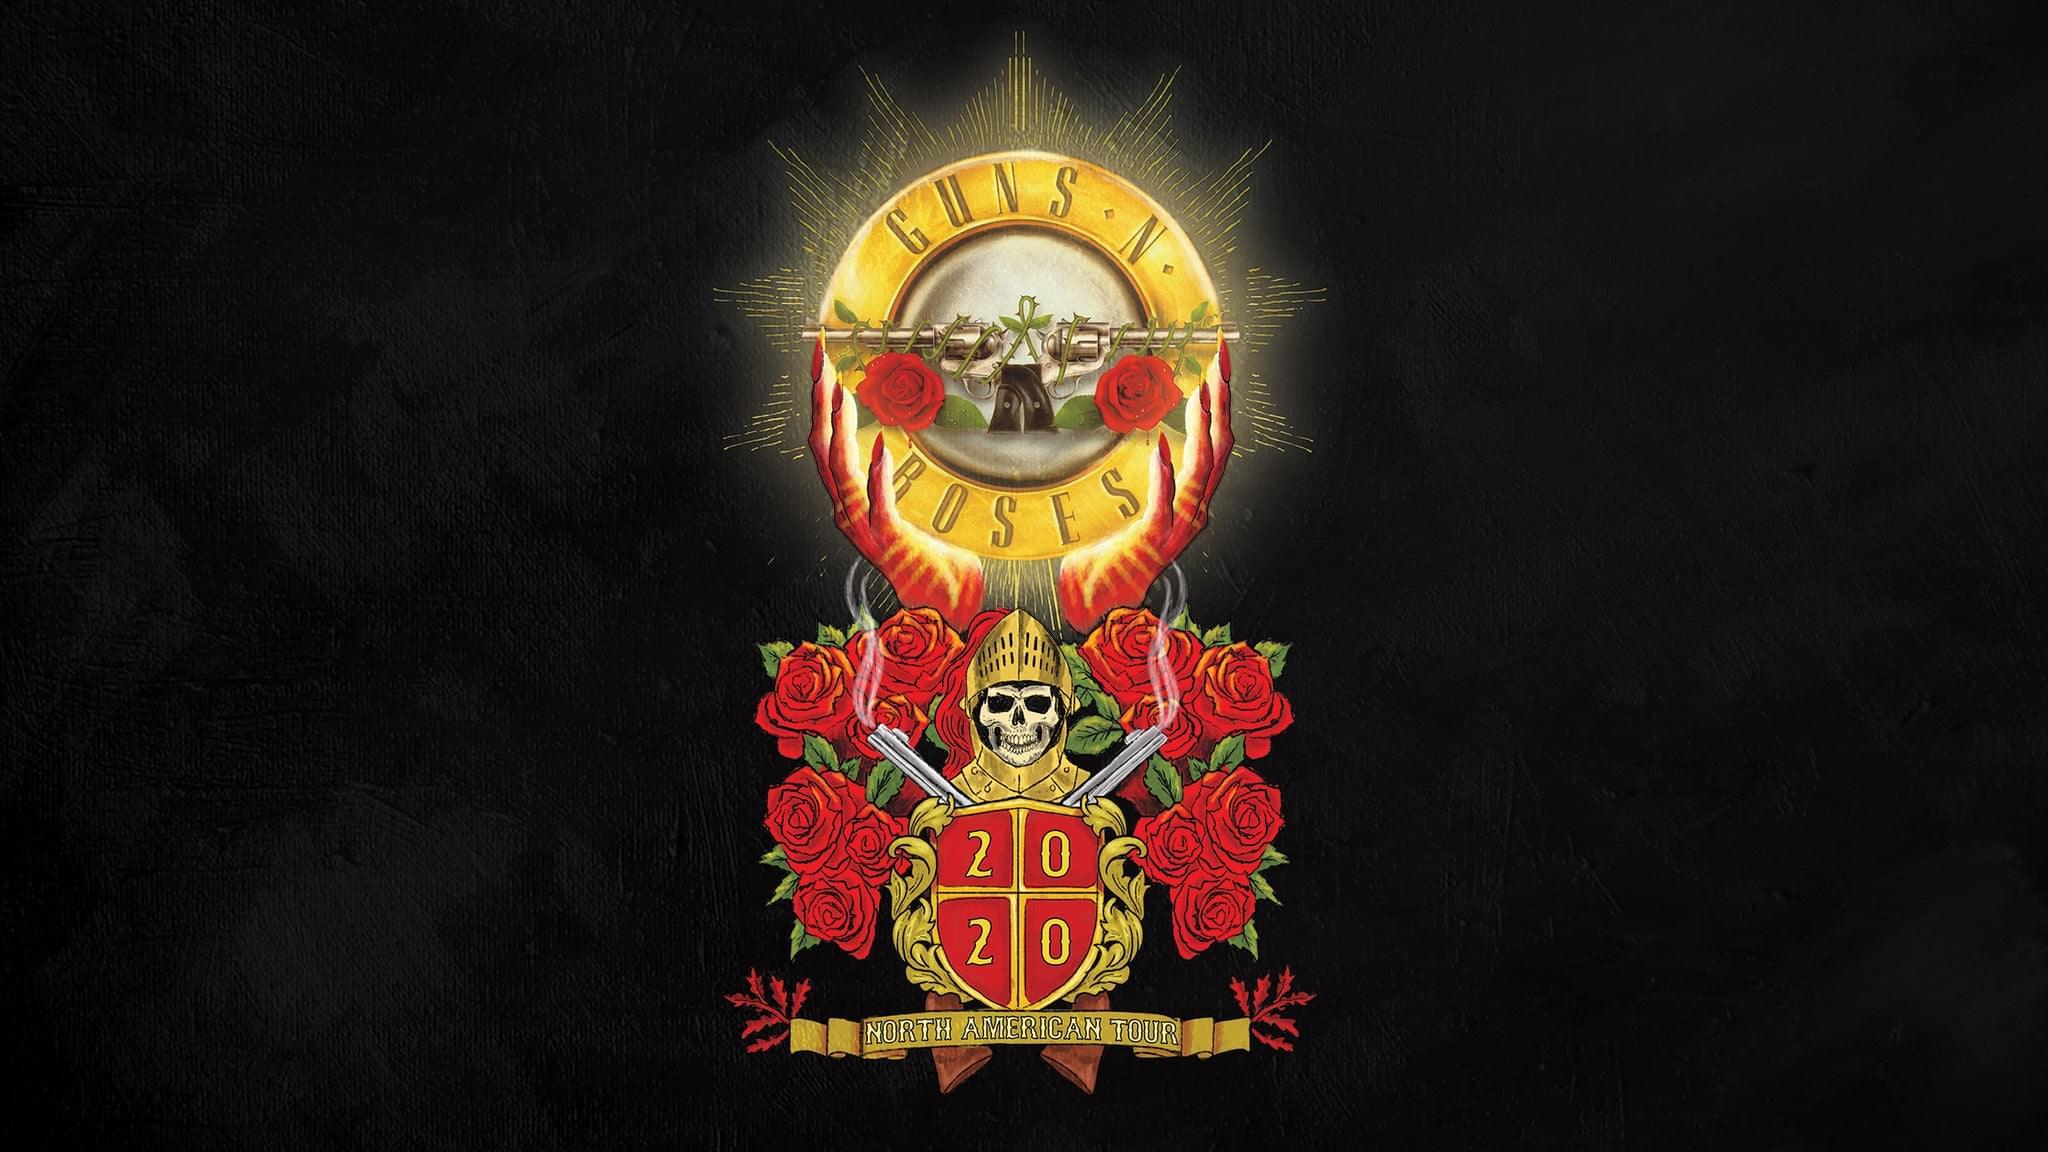 August 21 – Guns N' Roses [POSTPONED]